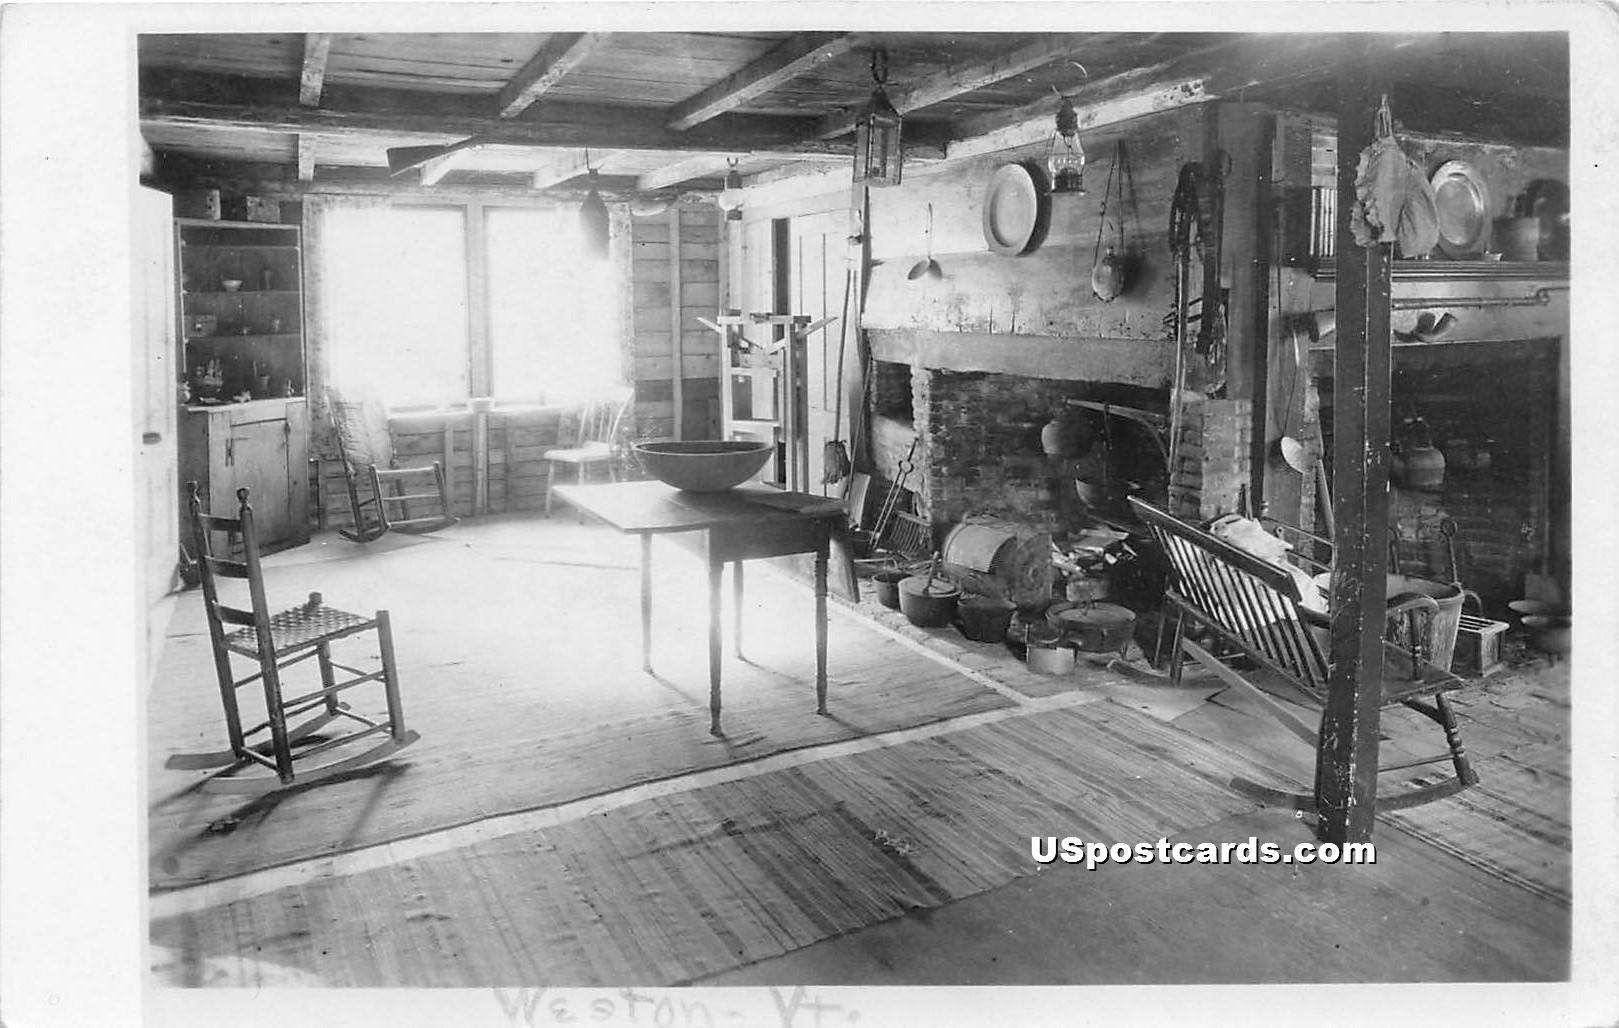 Fireplace - Weston, Vermont VT Postcard